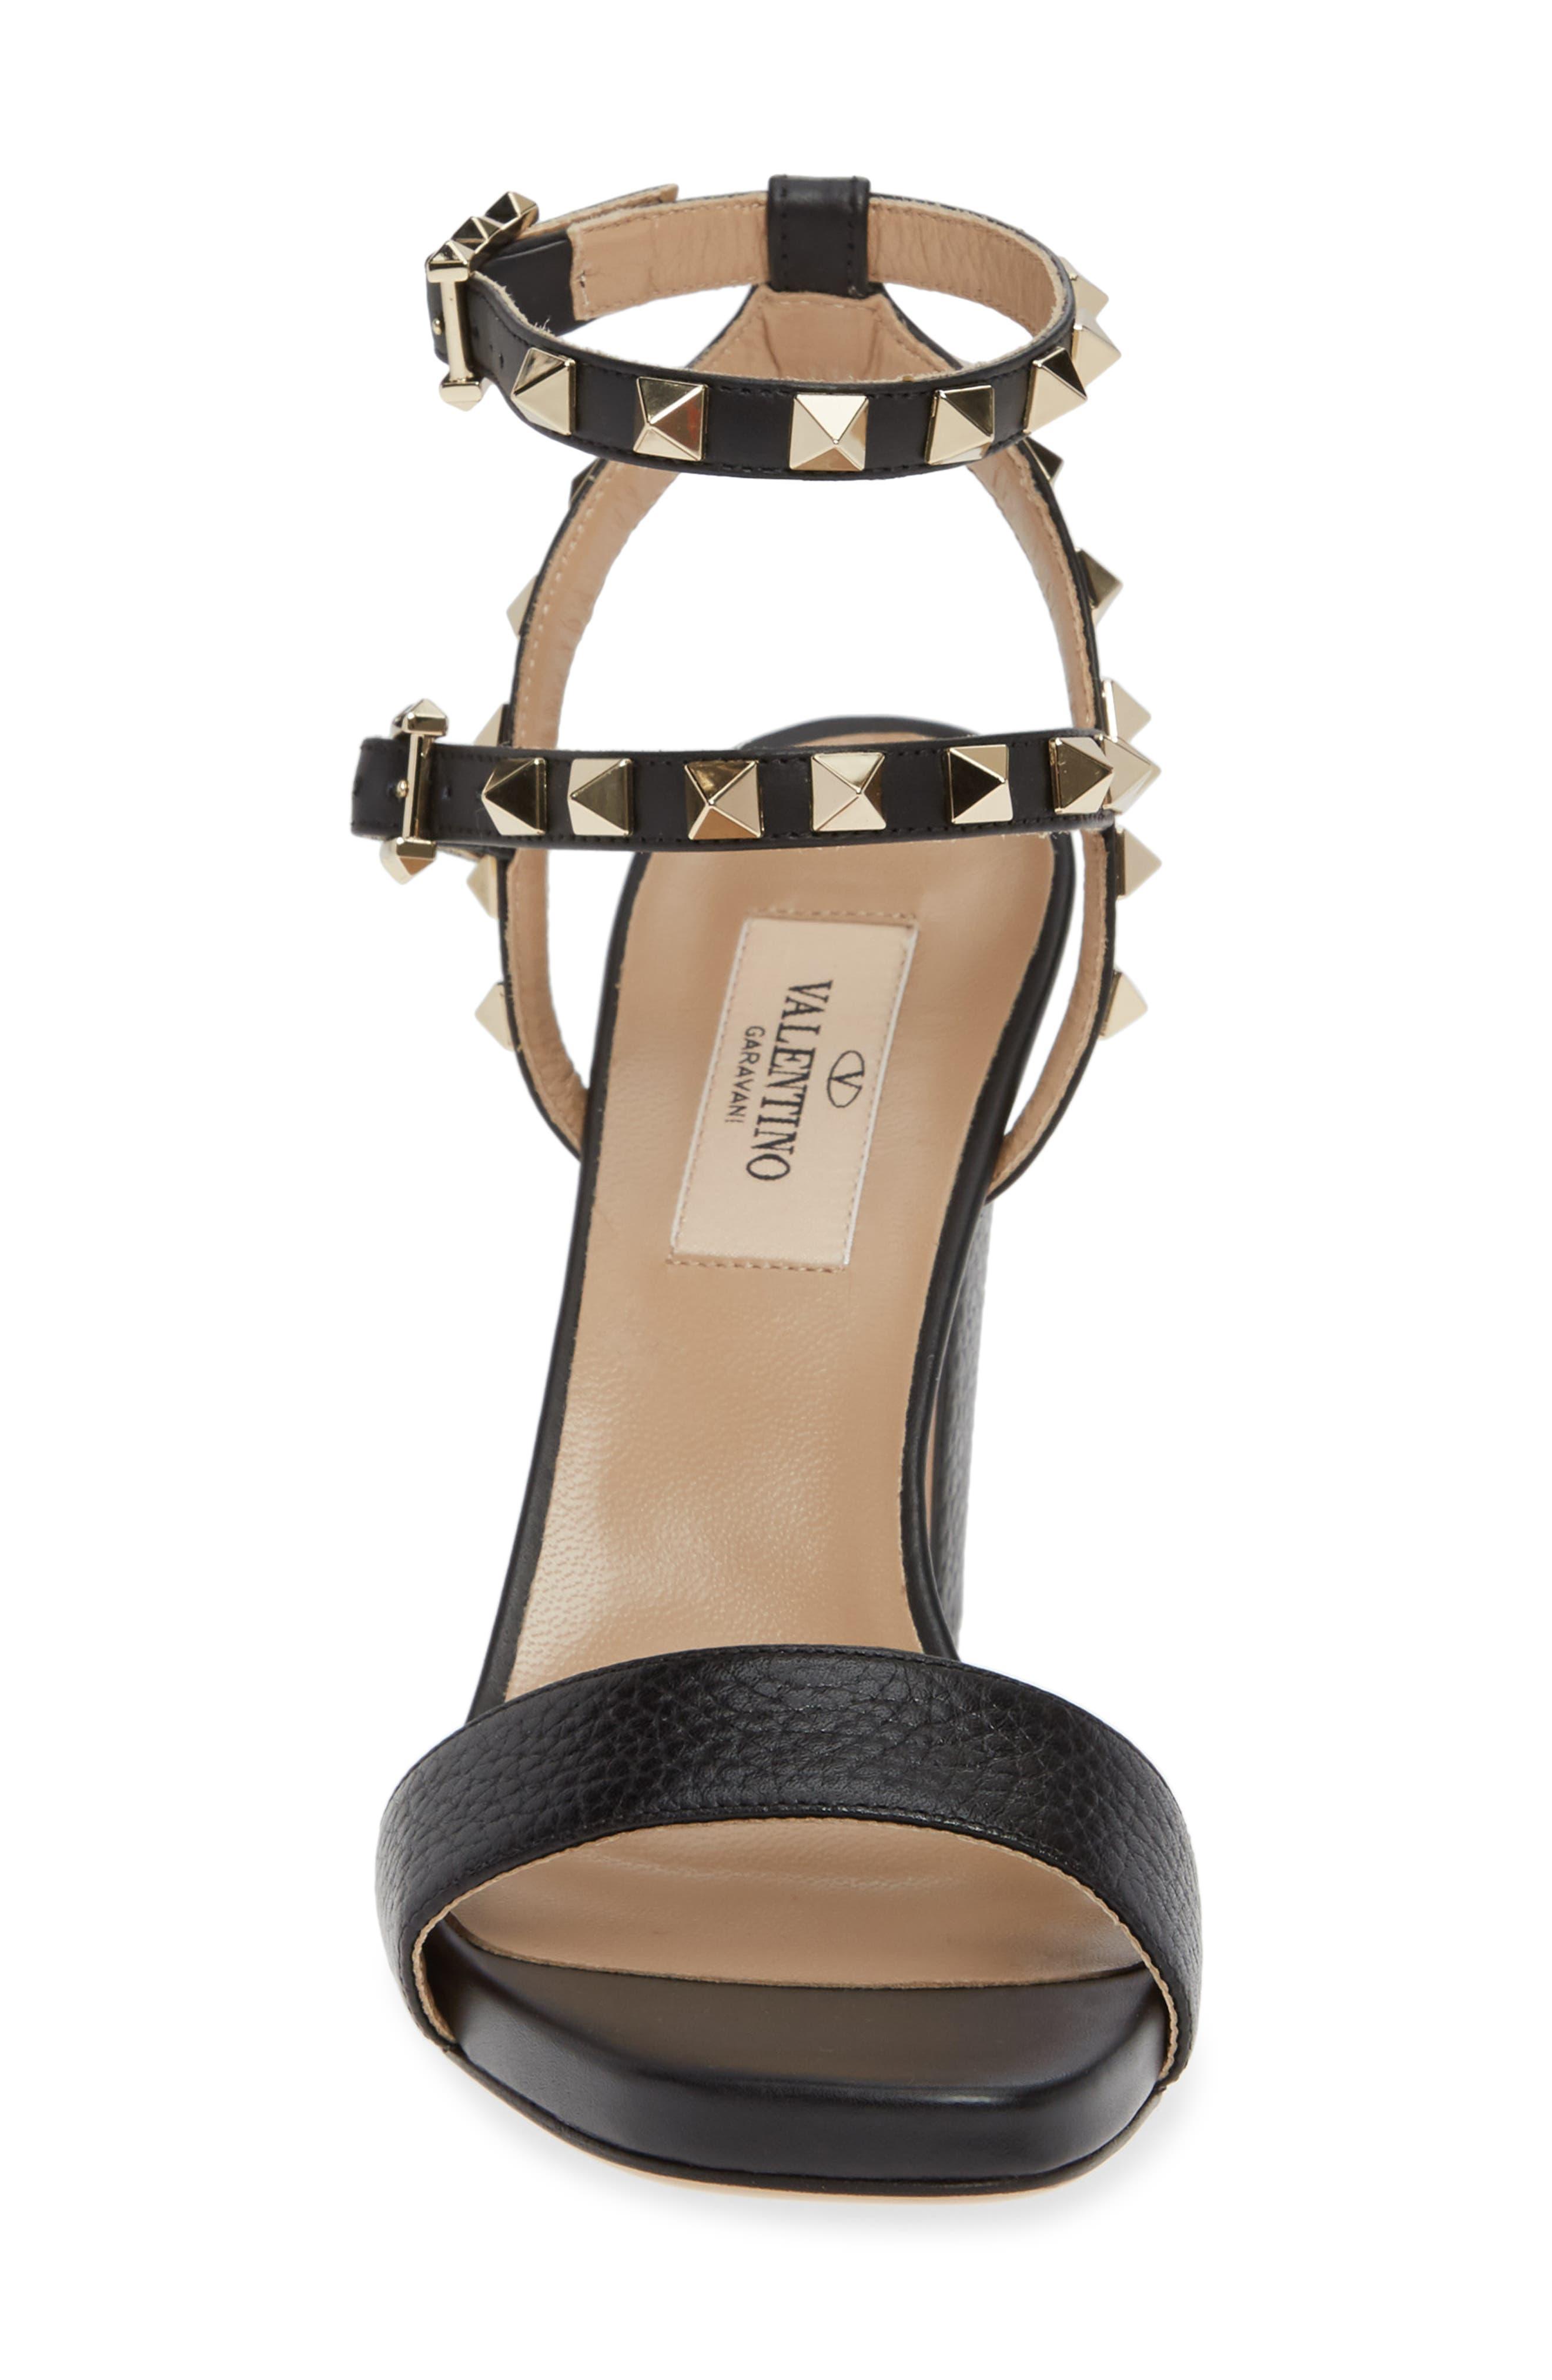 VALENTINO GARAVANI, Rockstud Ankle Strap Block Sandal, Alternate thumbnail 4, color, BLACK/ BLACK